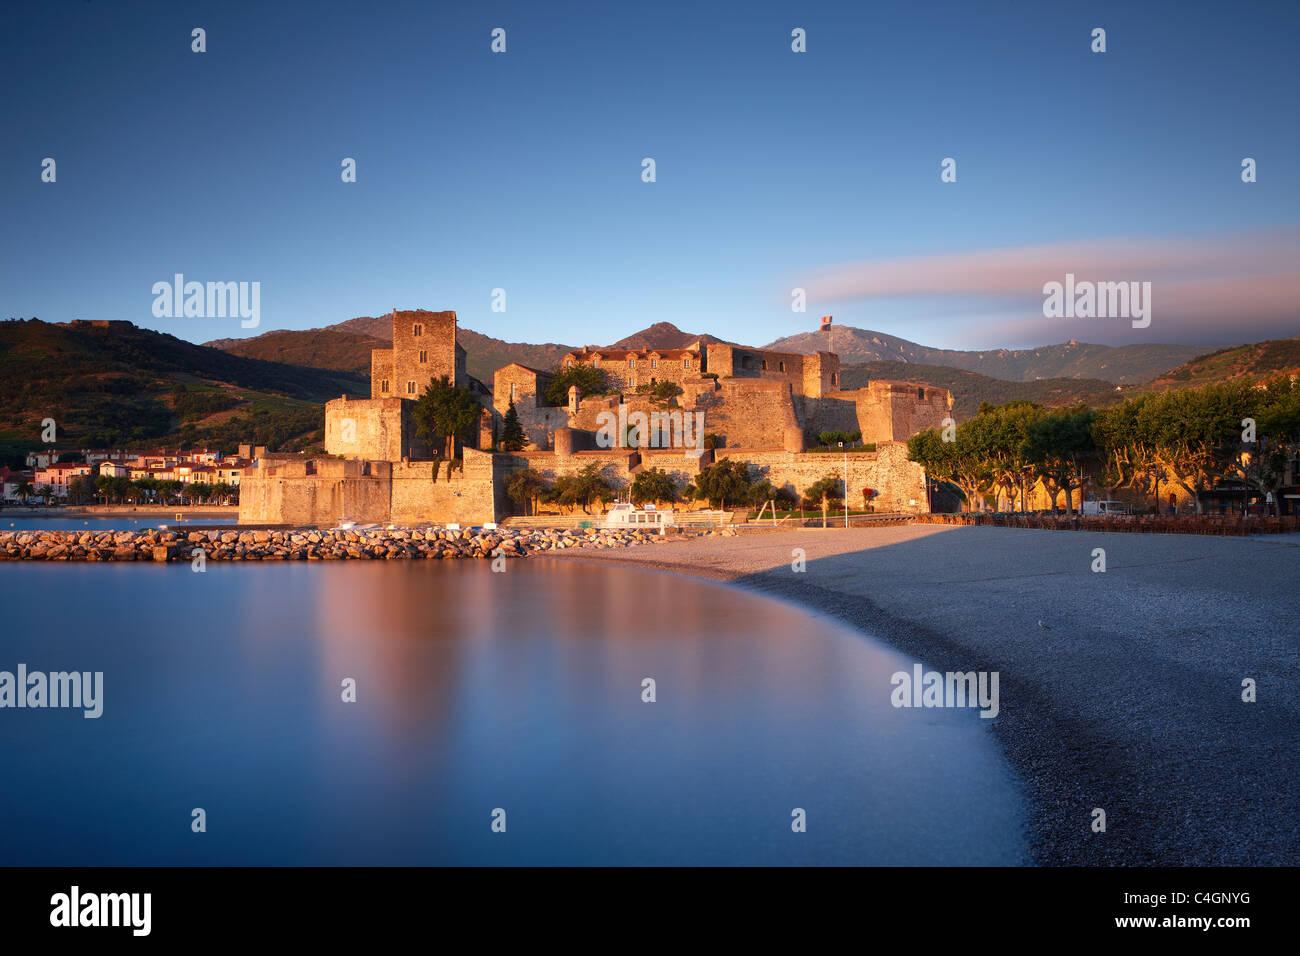 Collioure at dawn, Cote Vermeille, Pyranees Orientales, Languedoc-Rousillon, France - Stock Image